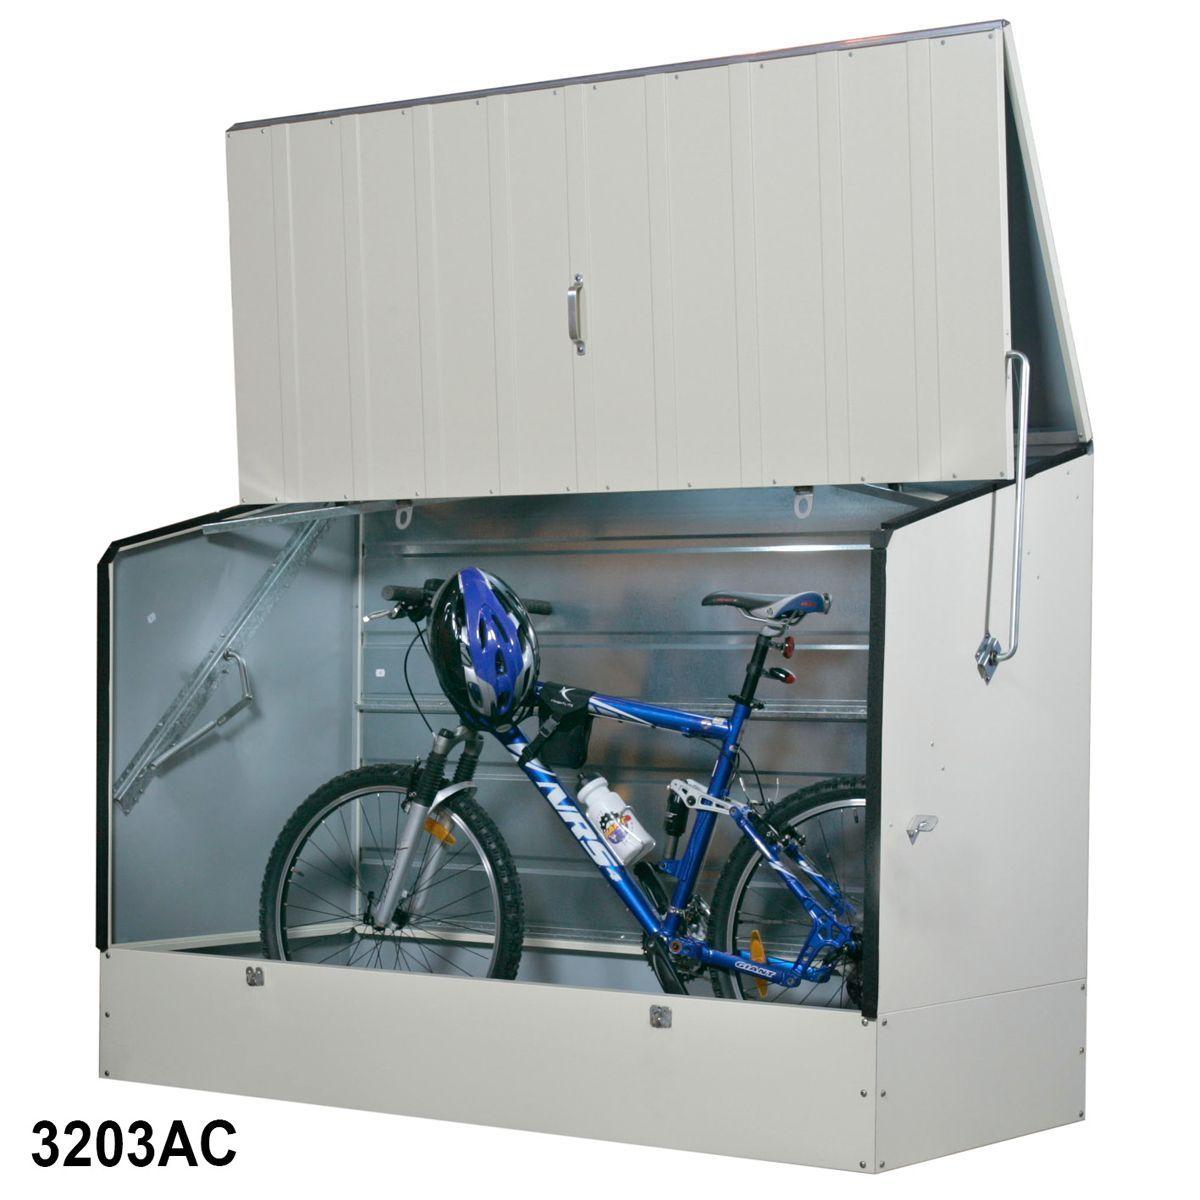 Bike Storage Sheds in 2020 Bicycle storage, Bicycle